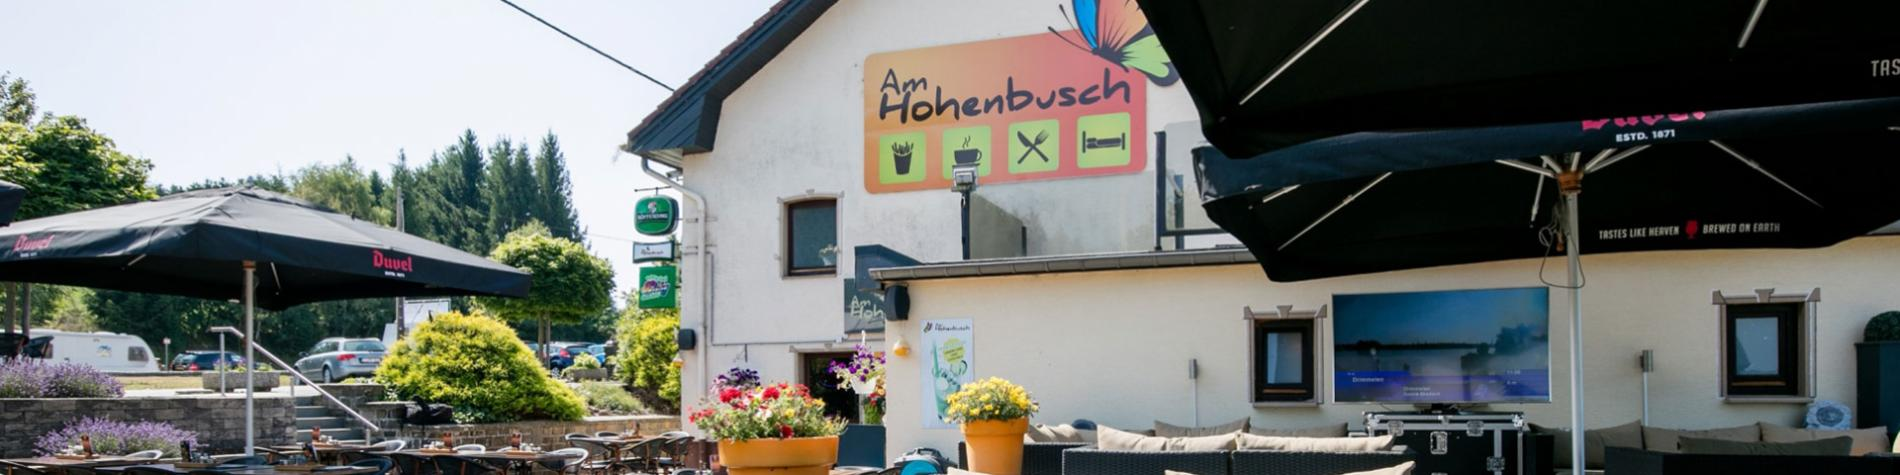 Camping Hohenbusch - Burg-Reuland - Friture